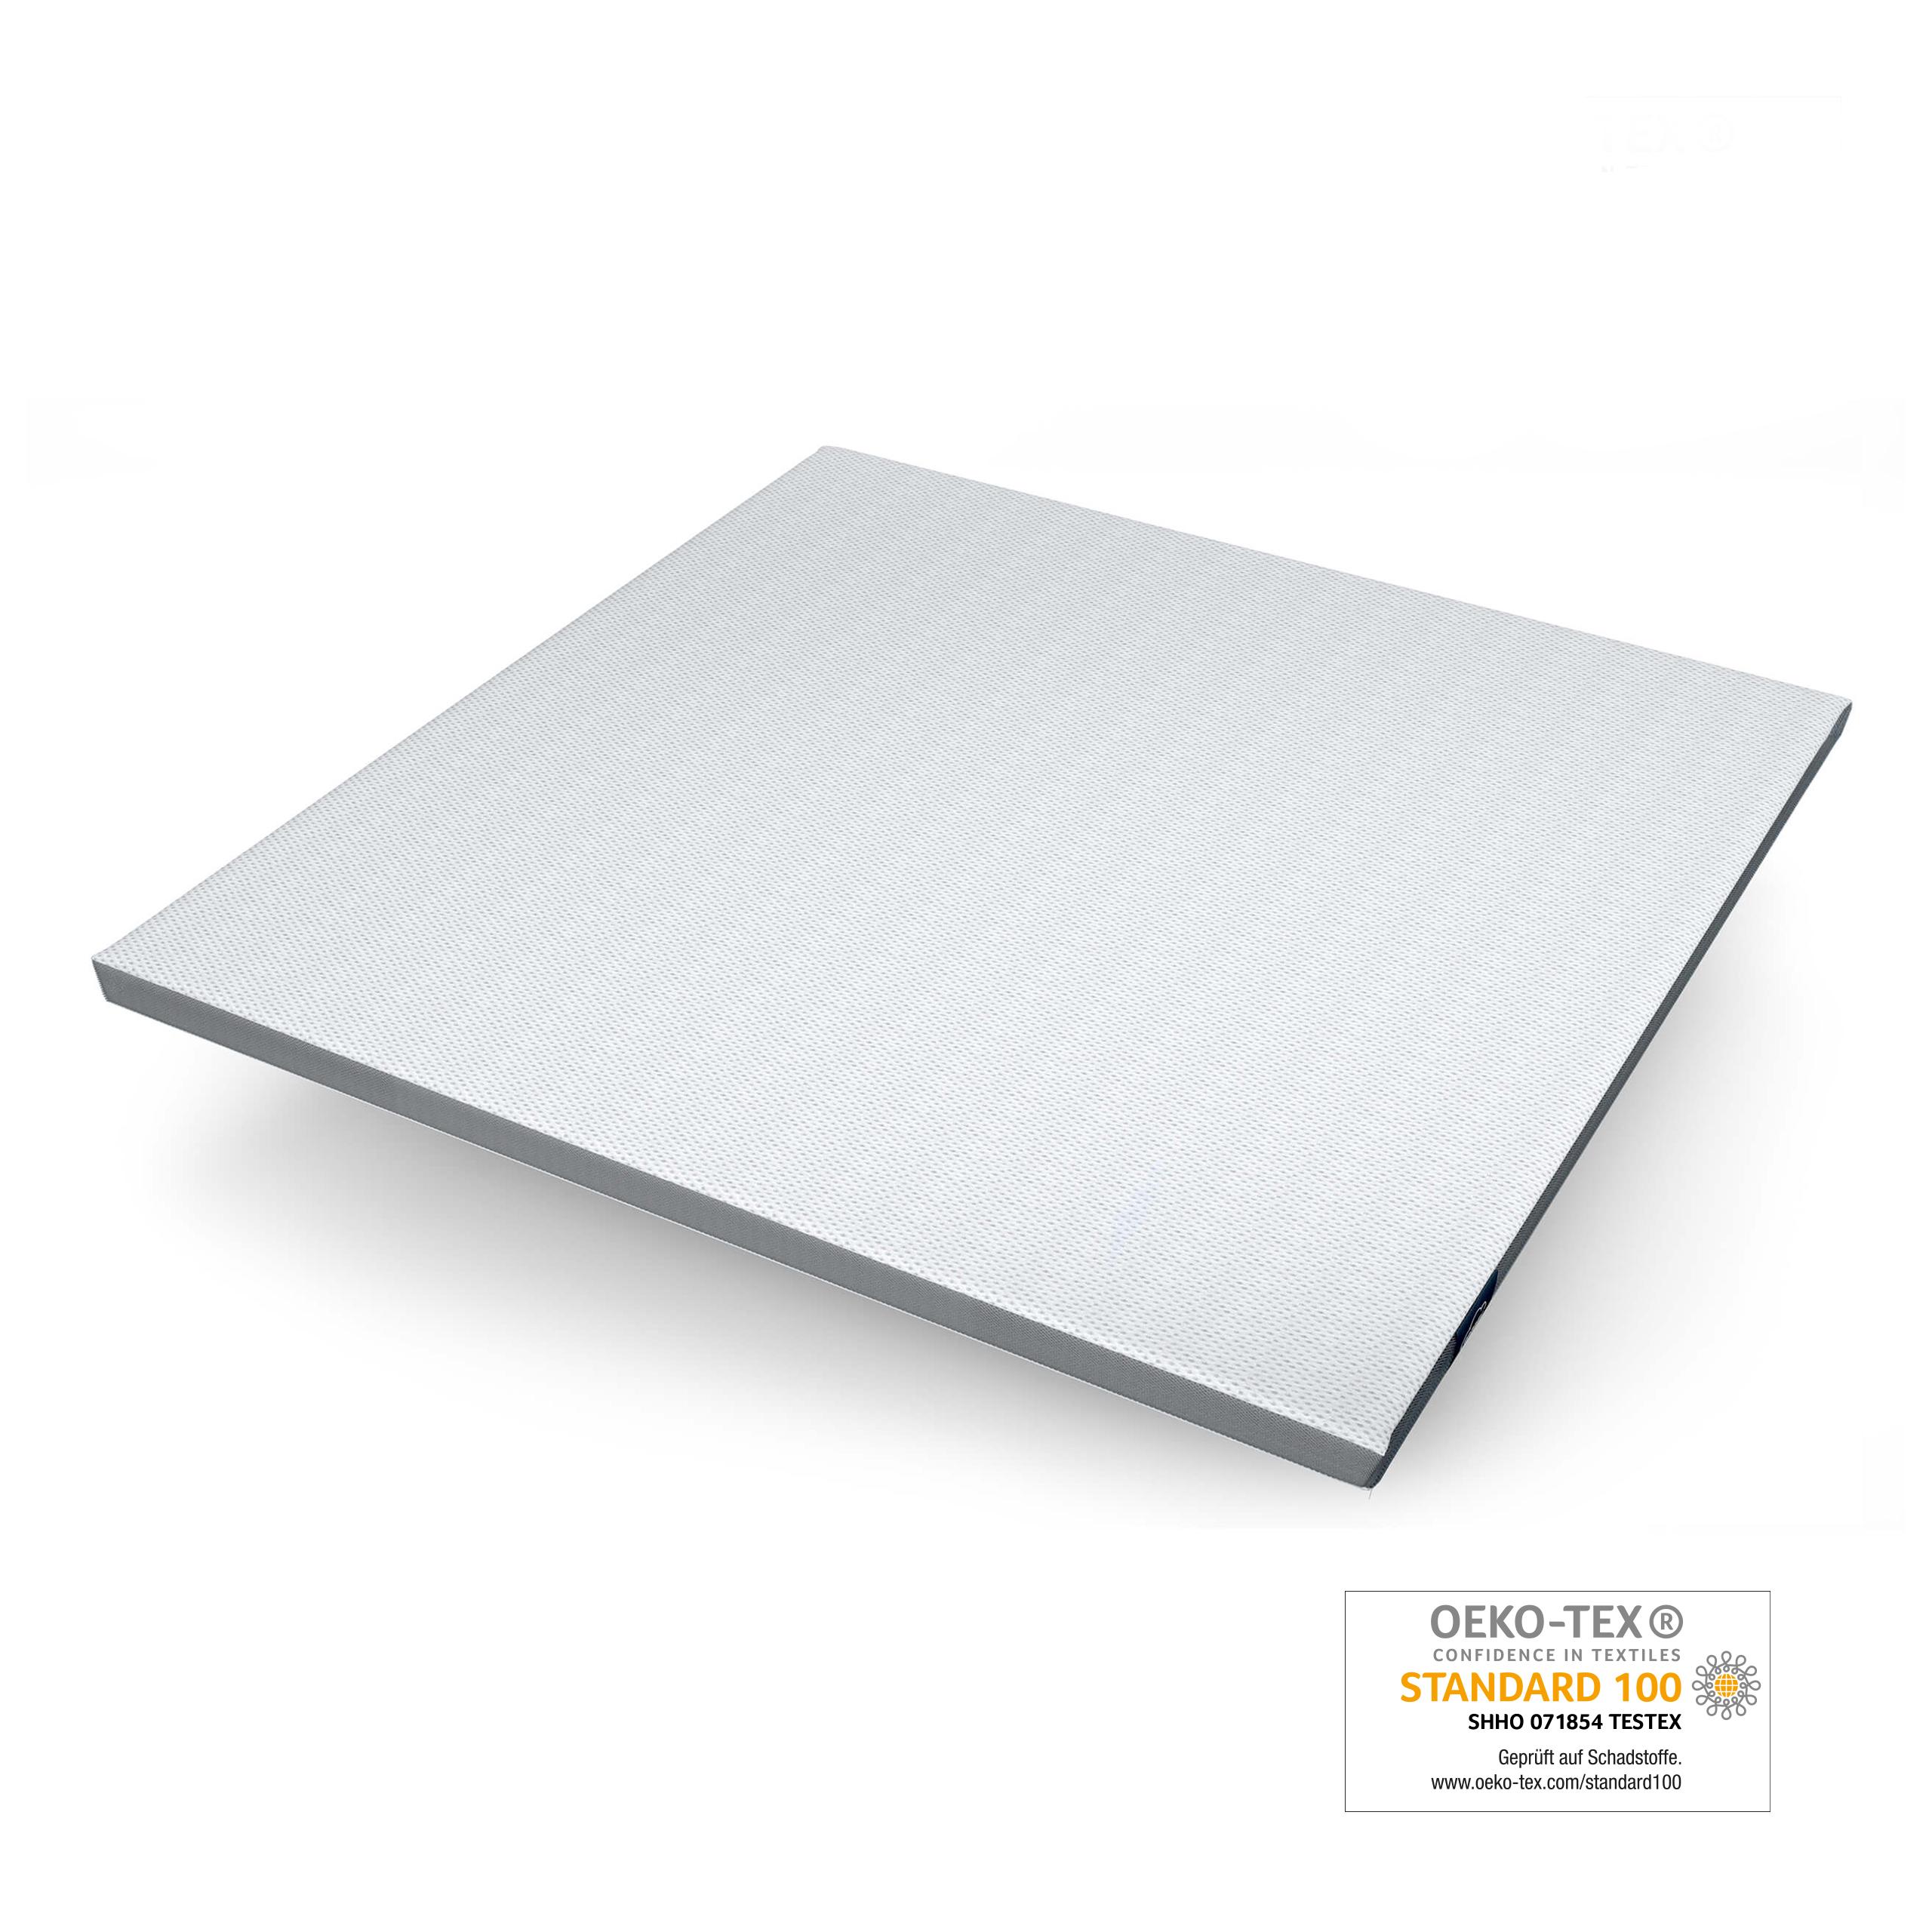 Genius eazzzy | Matratzentopper 200 x 200 x 7 cm A19247